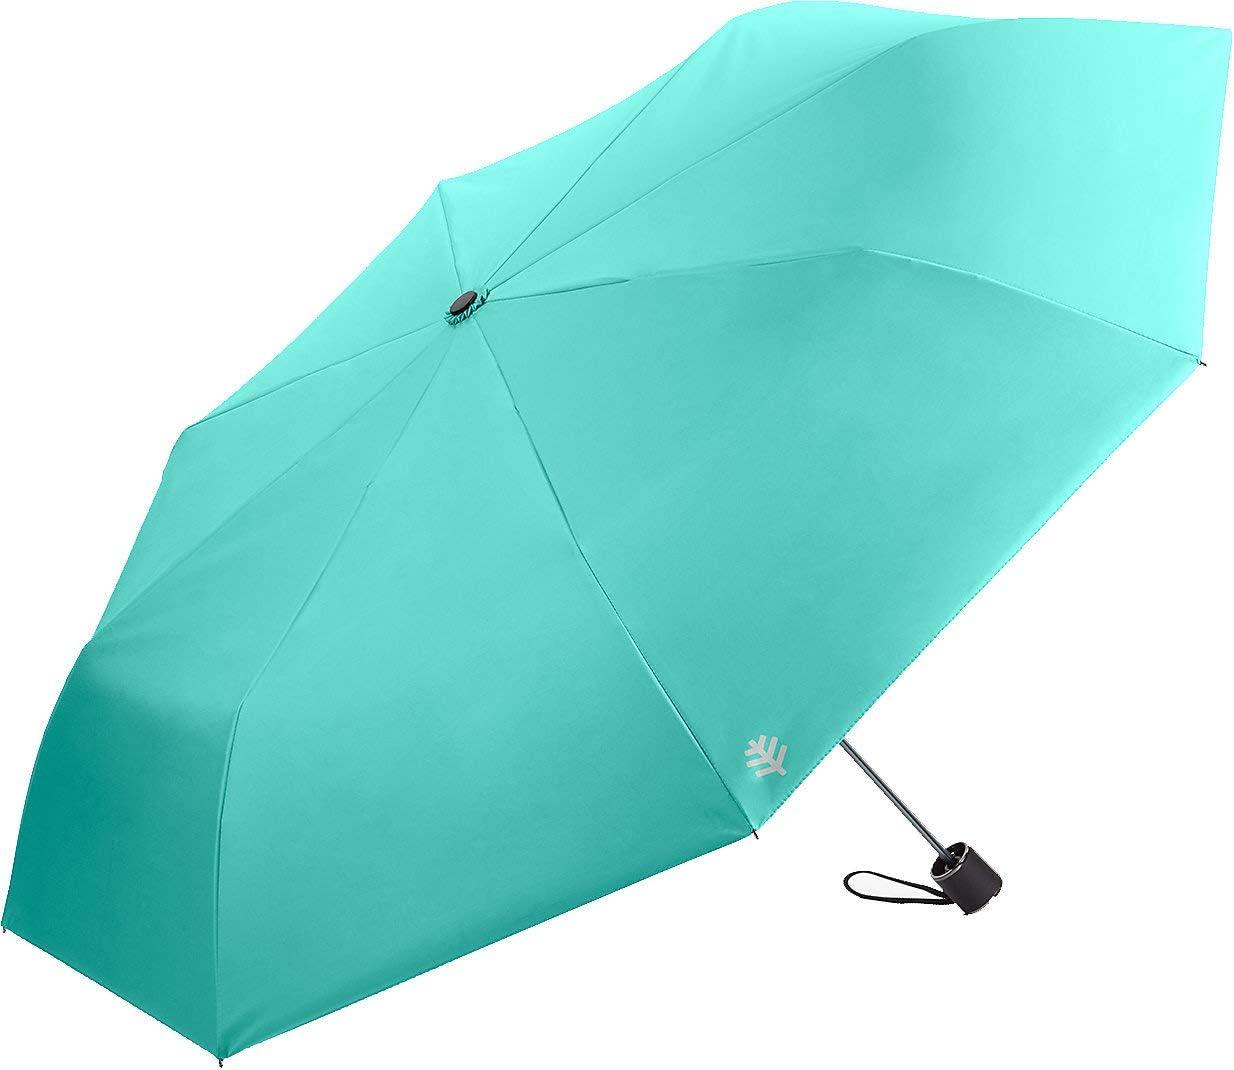 Coolibar UPF 50+ Bund Compact Umbrella - Sun Protective (One Size- Cooliblue)